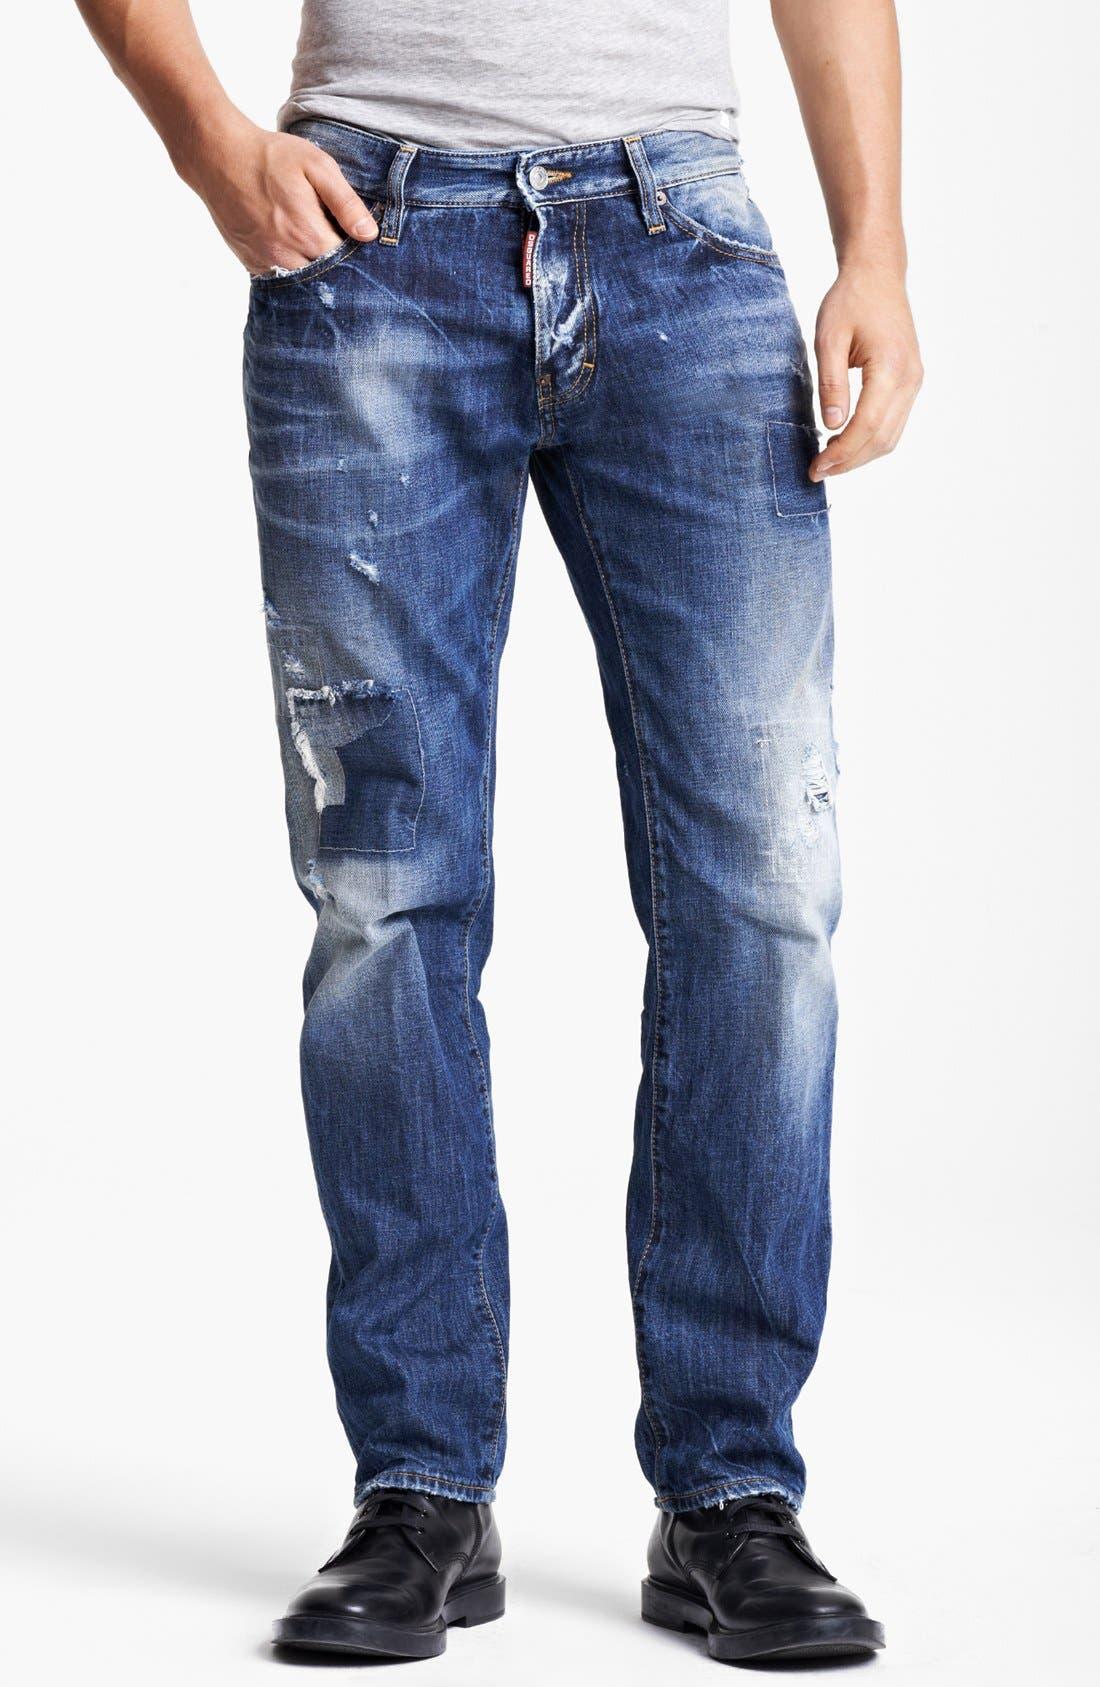 Alternate Image 1 Selected - Dsquared2 'Dean' Slim Fit Jeans (Distressed Blue)